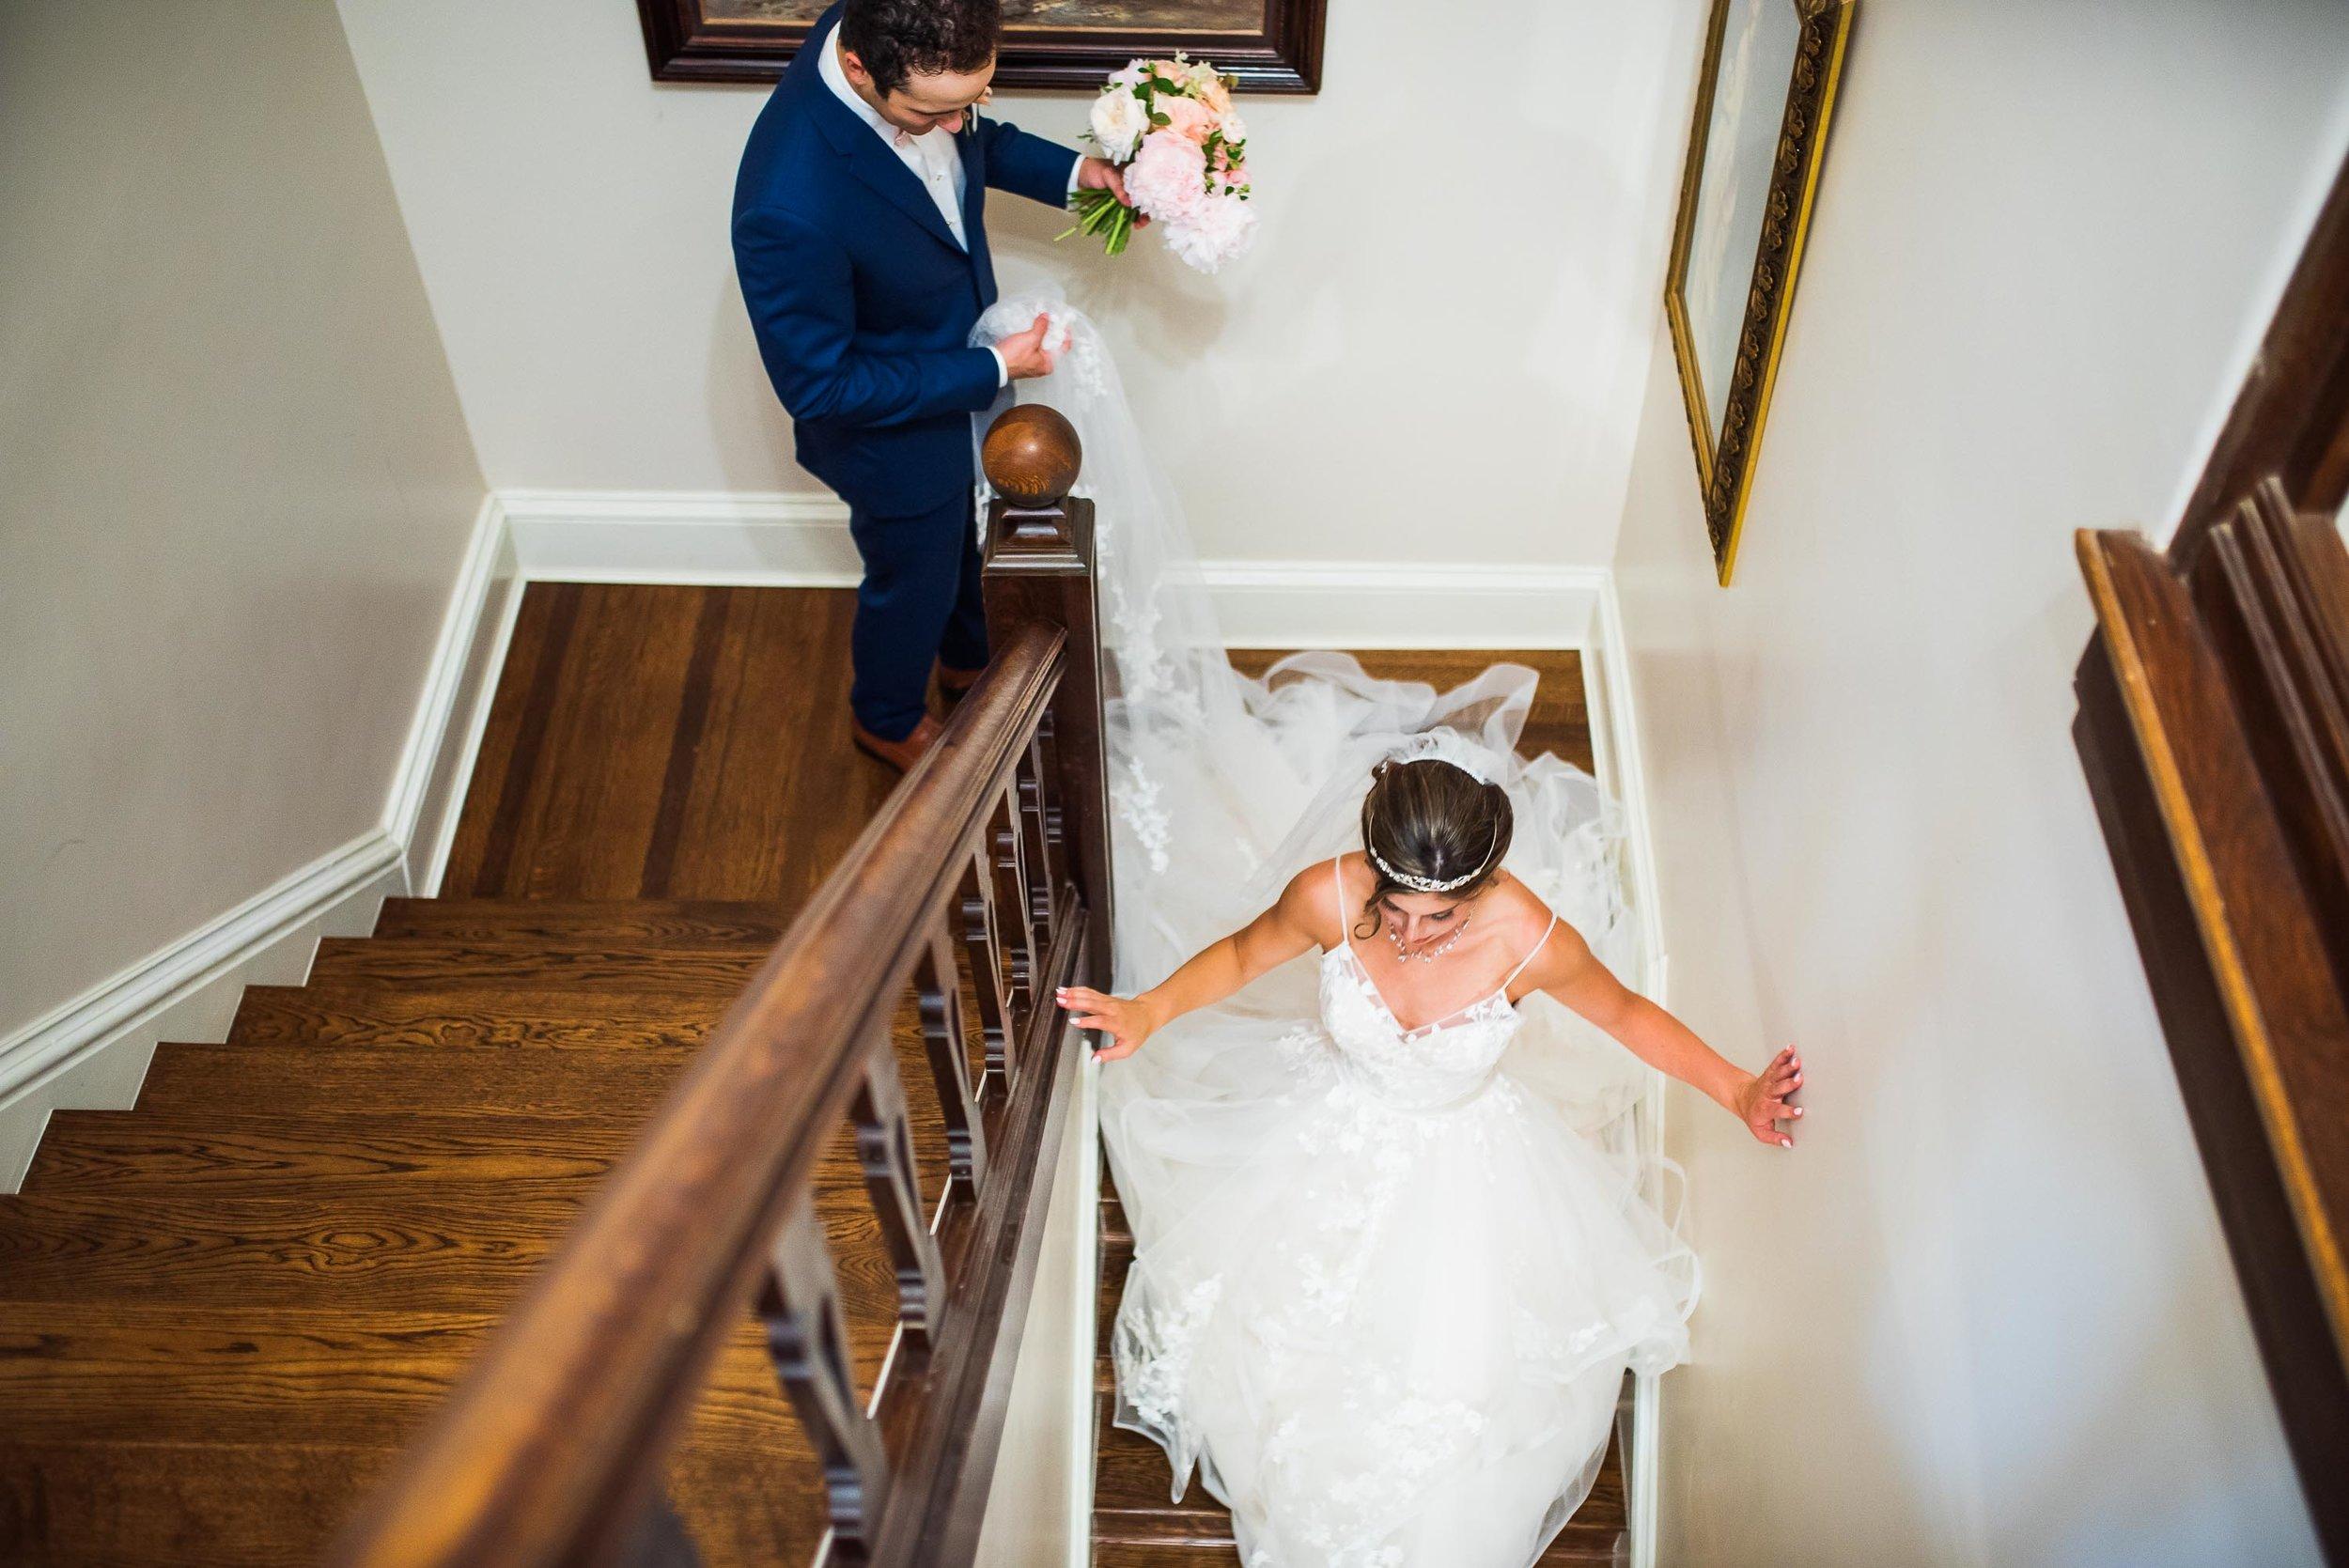 thornewood castle wedding 39.jpg